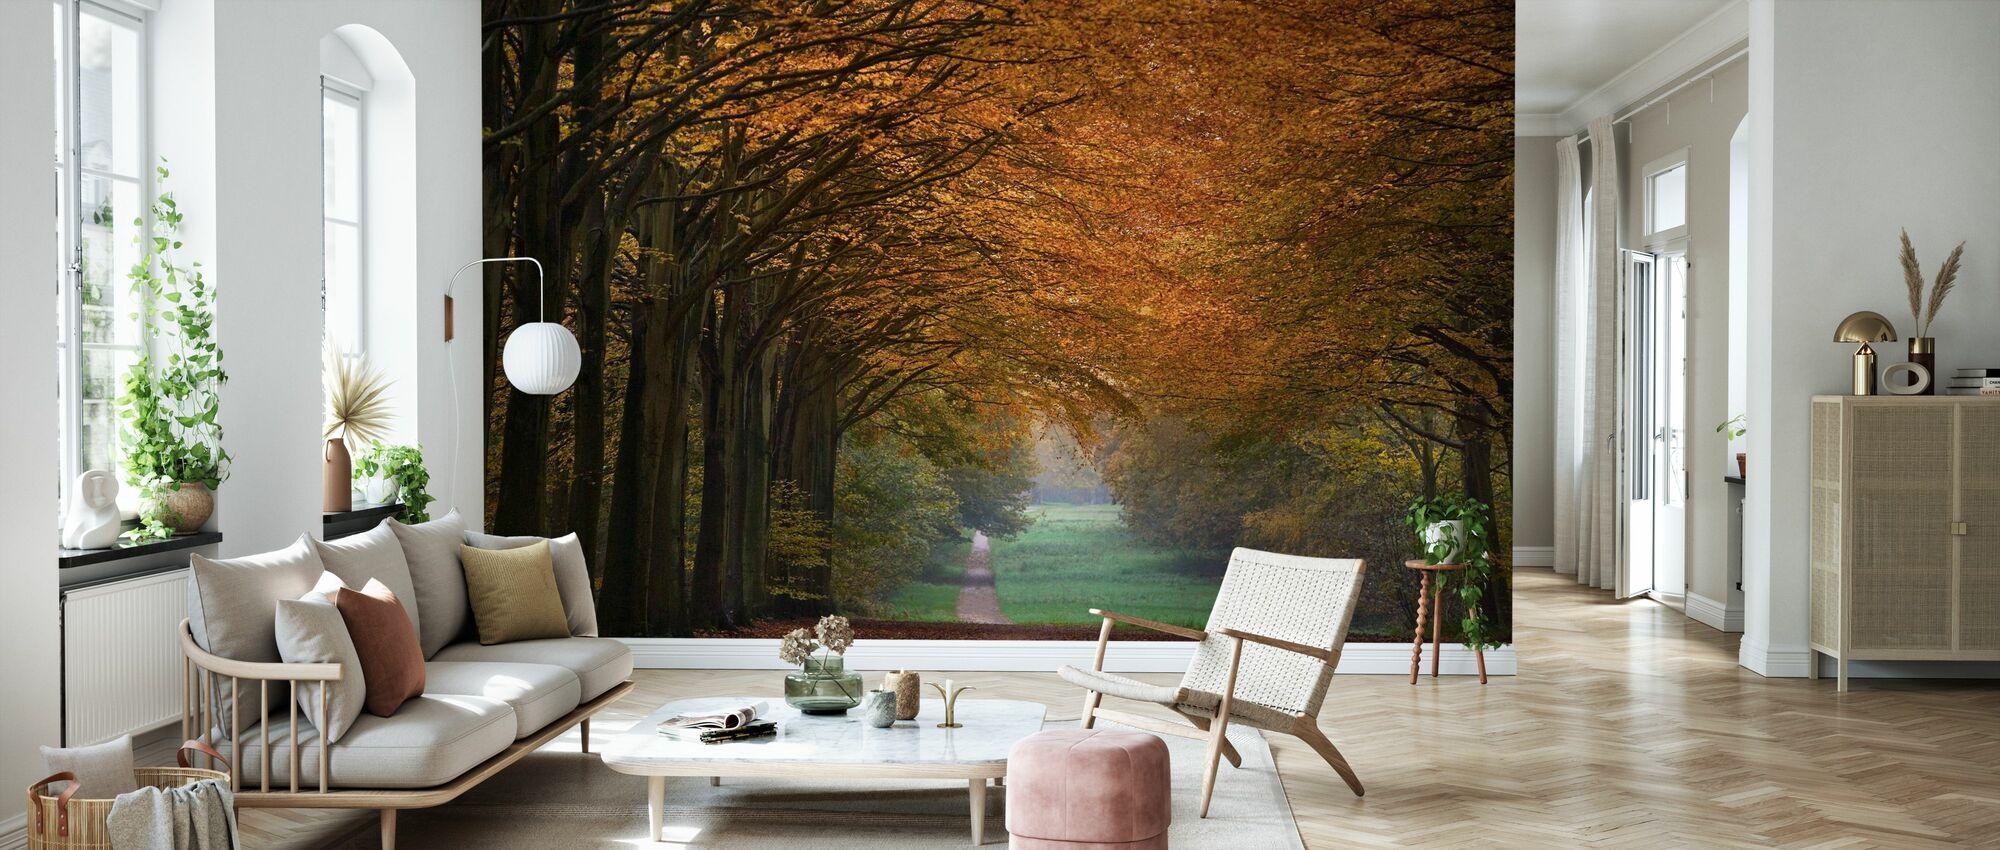 Great Wood Alley - Wallpaper - Living Room